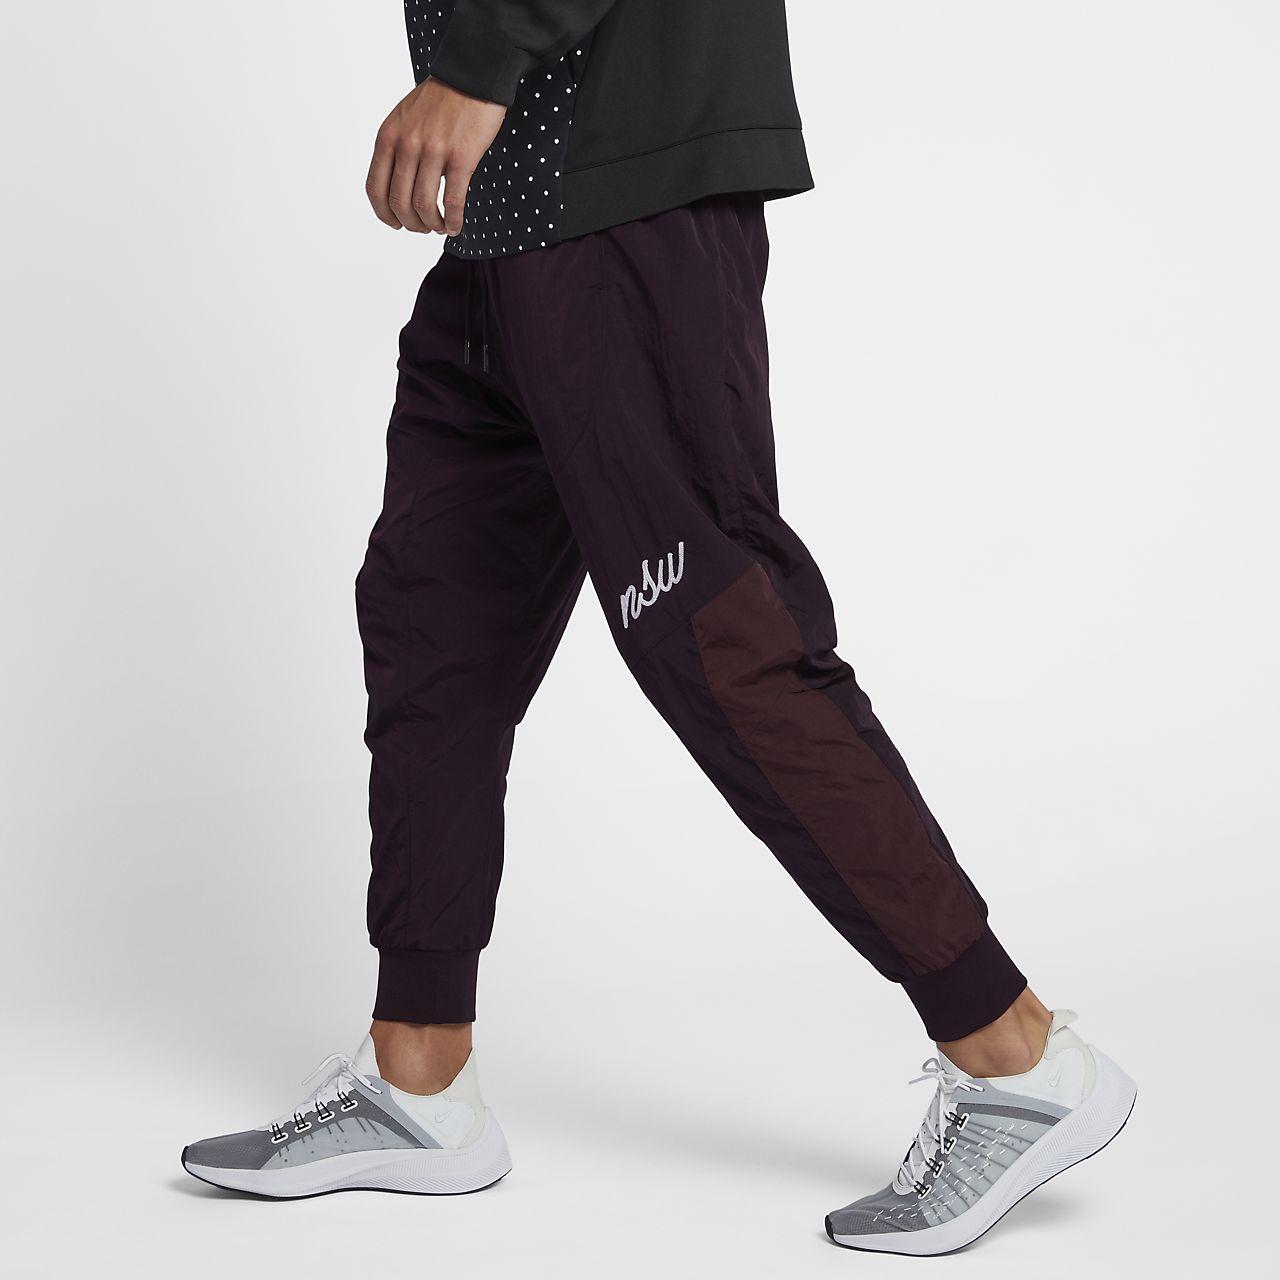 14dac66f048e0d Nike Sportswear NSW Men s Woven Joggers. Nike.com GB